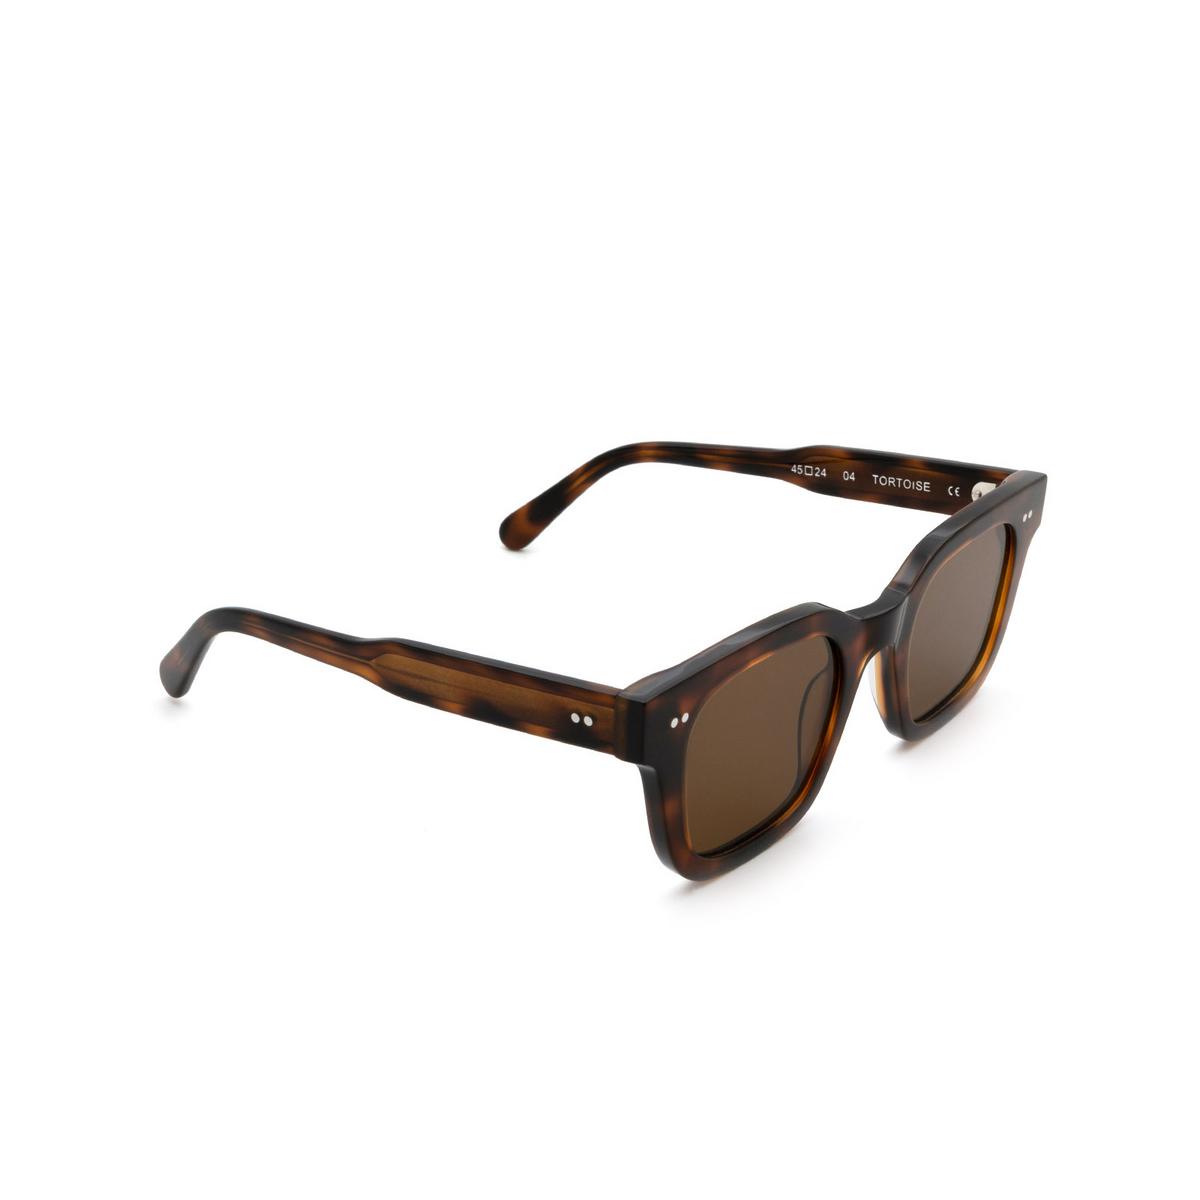 Chimi® Square Sunglasses: 04 color Tortoise - three-quarters view.